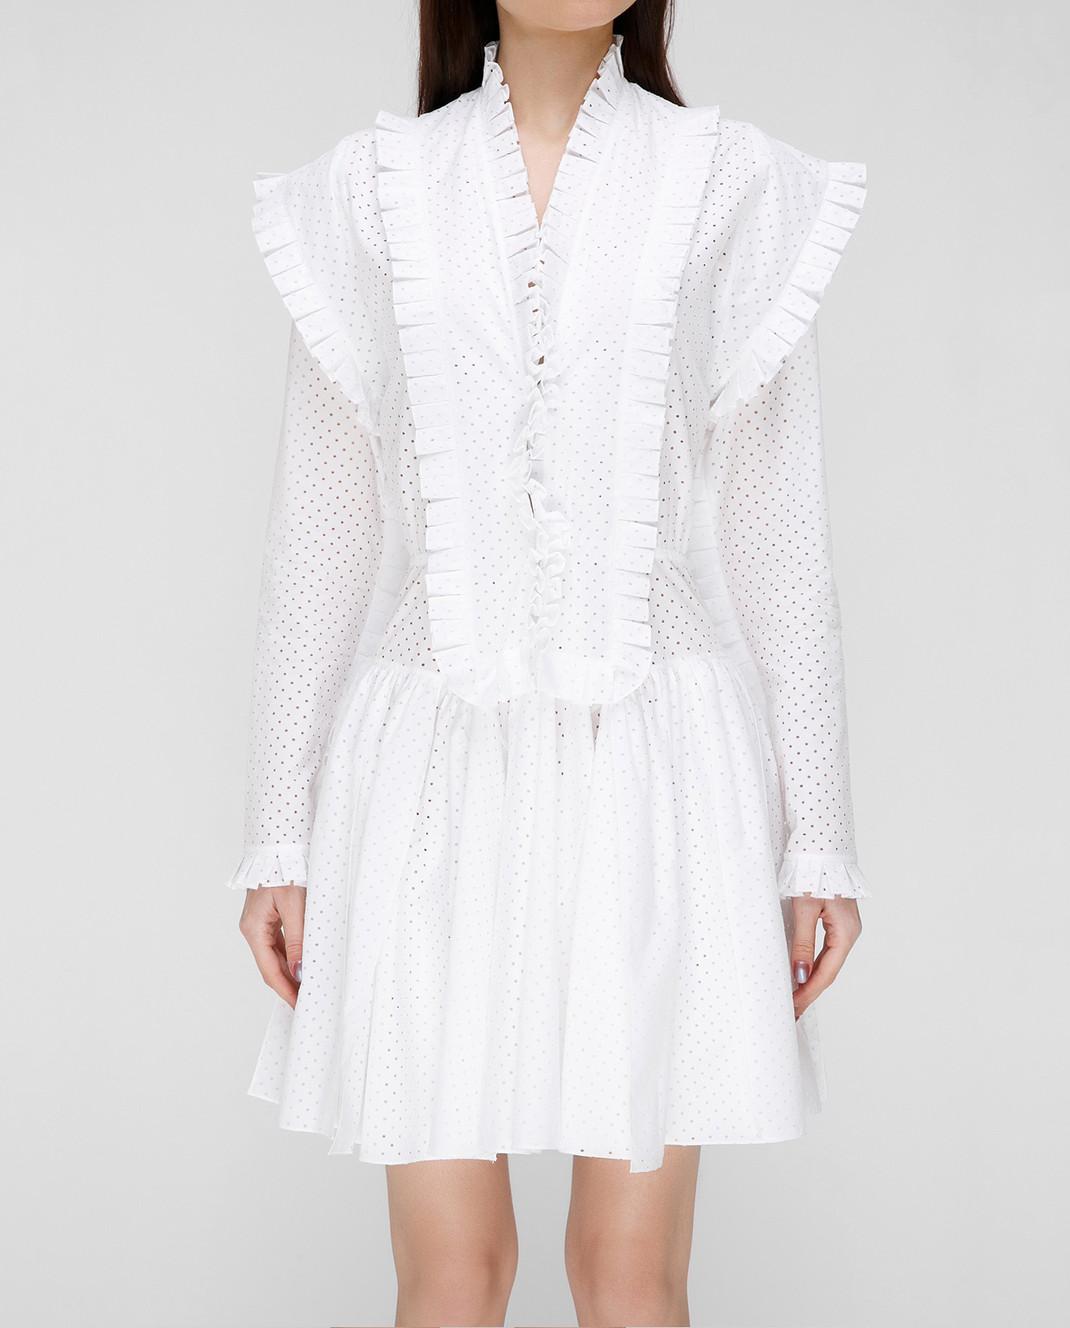 Azzedine Alaia Белое платье 7S9R054RTL48 изображение 3